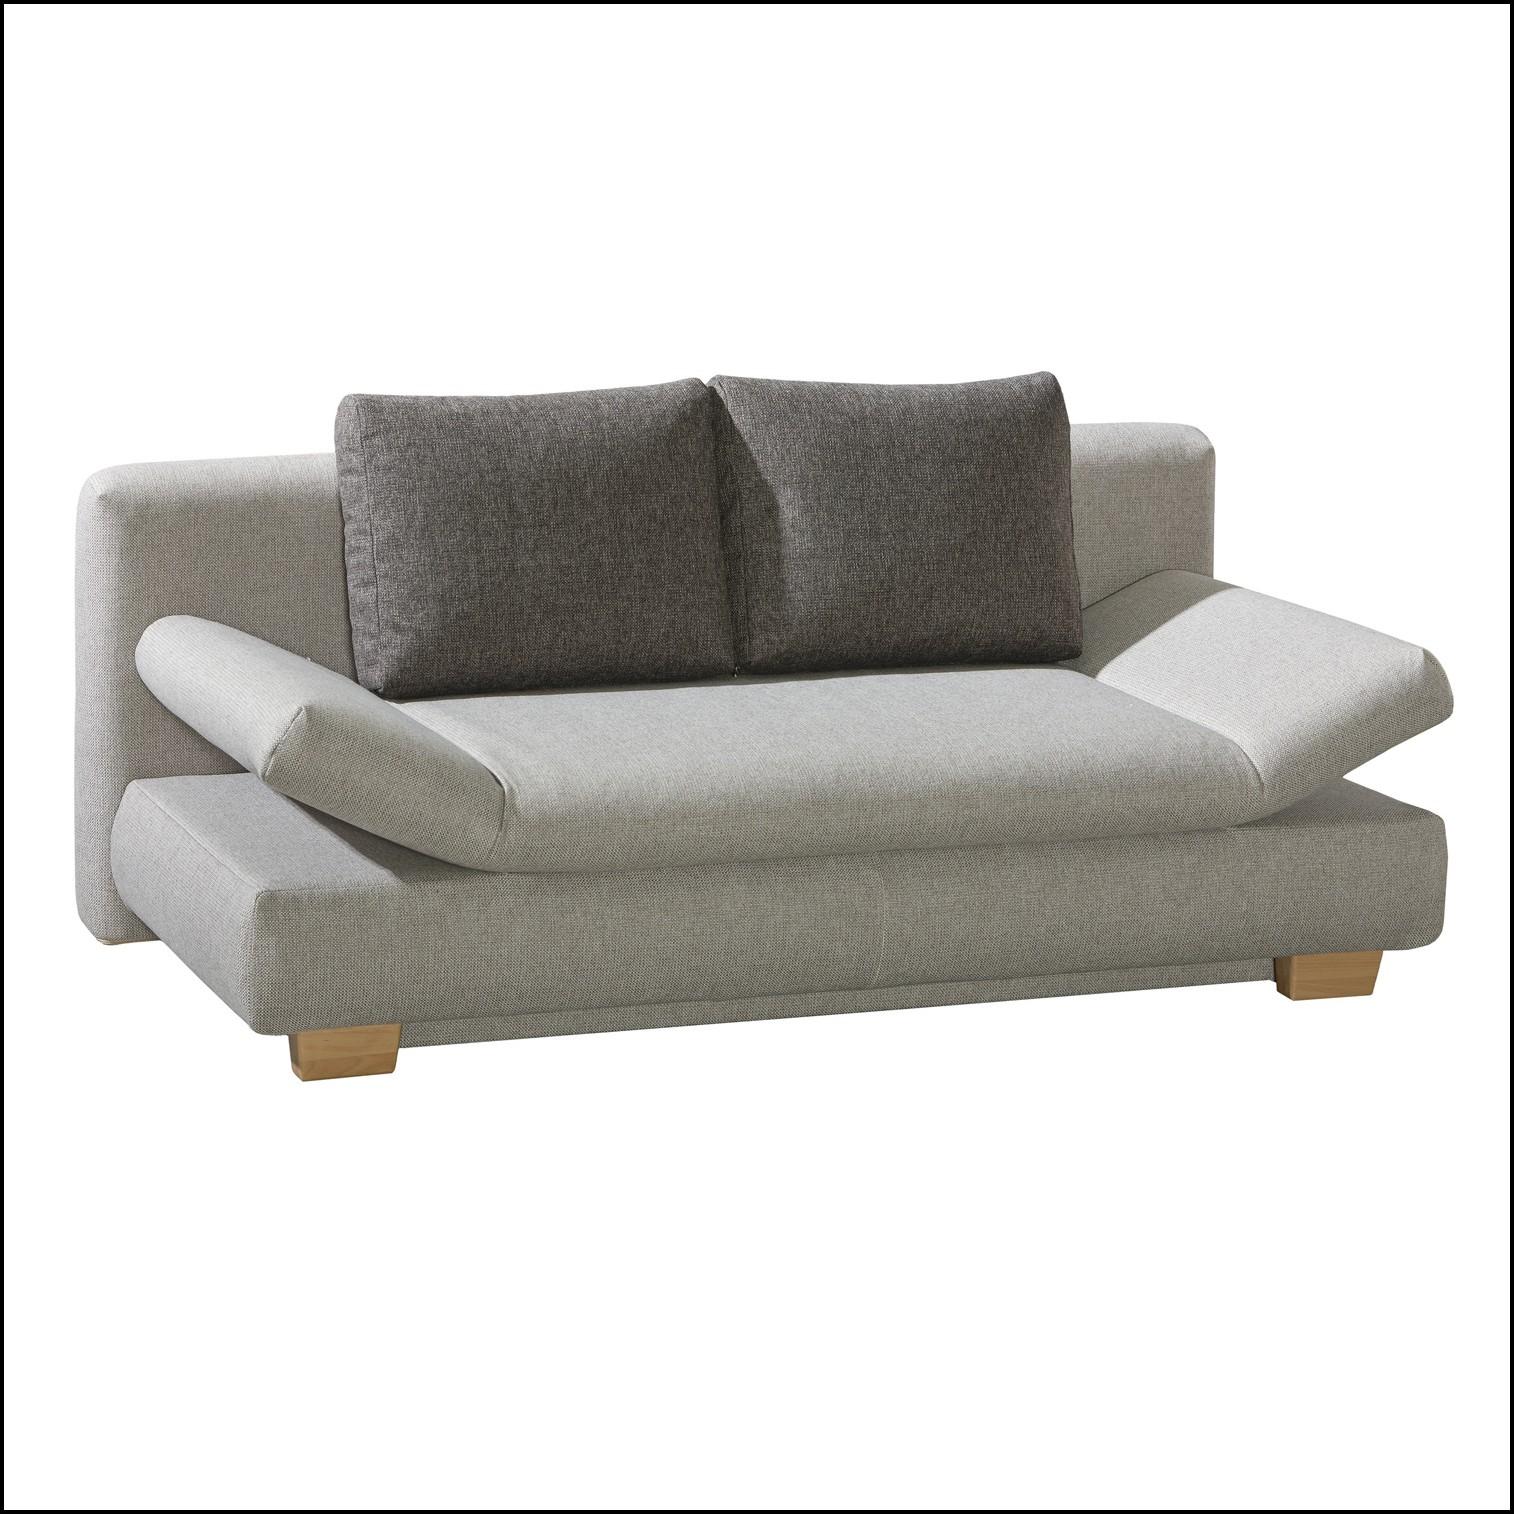 Möbel Hardeck Sofas